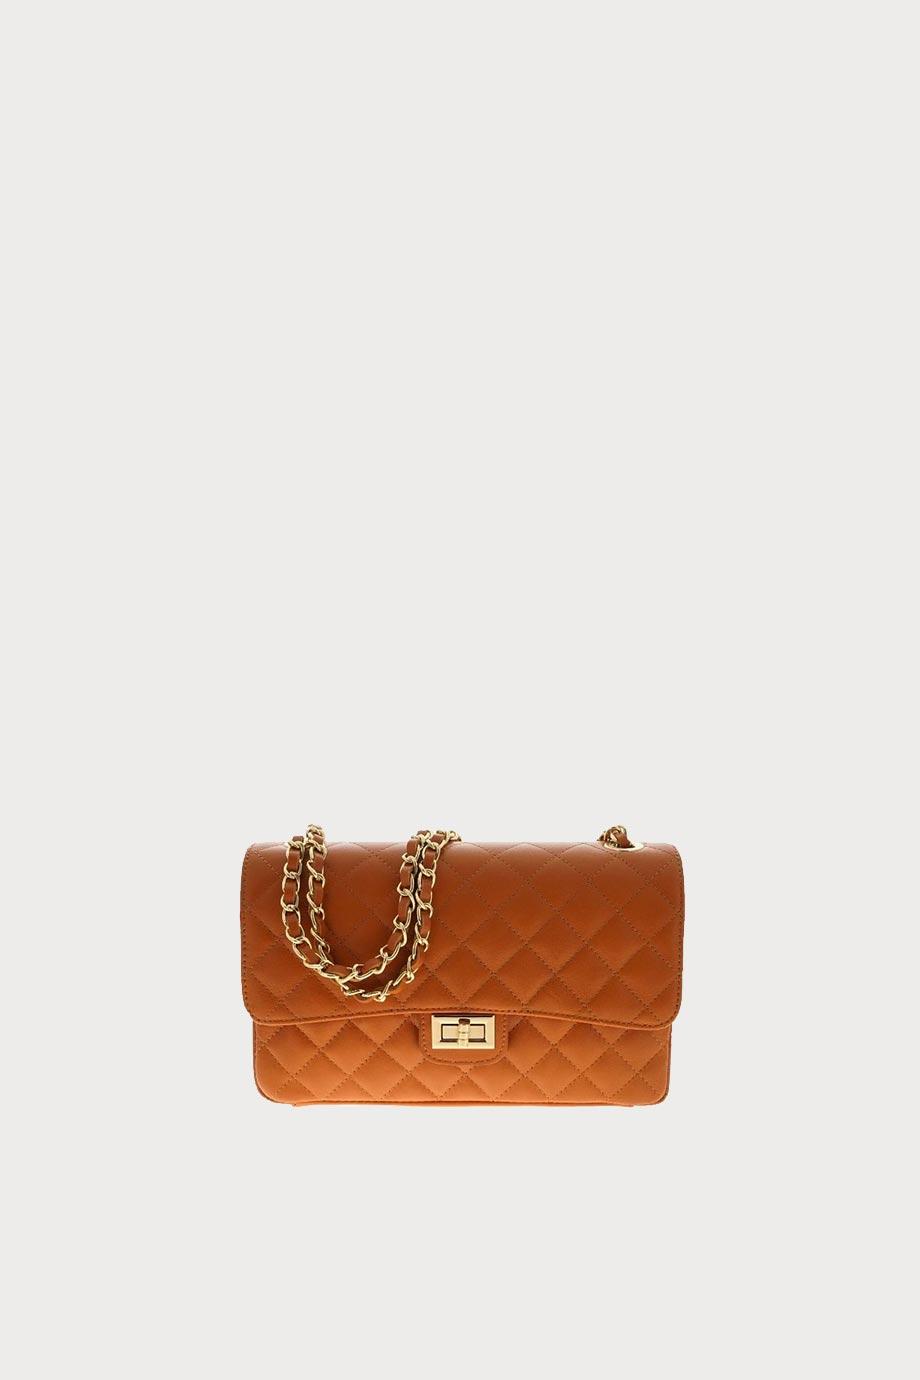 spiridoula metheniti shoes xalkida p ss17 7106 cuoio leather side bag 19v69